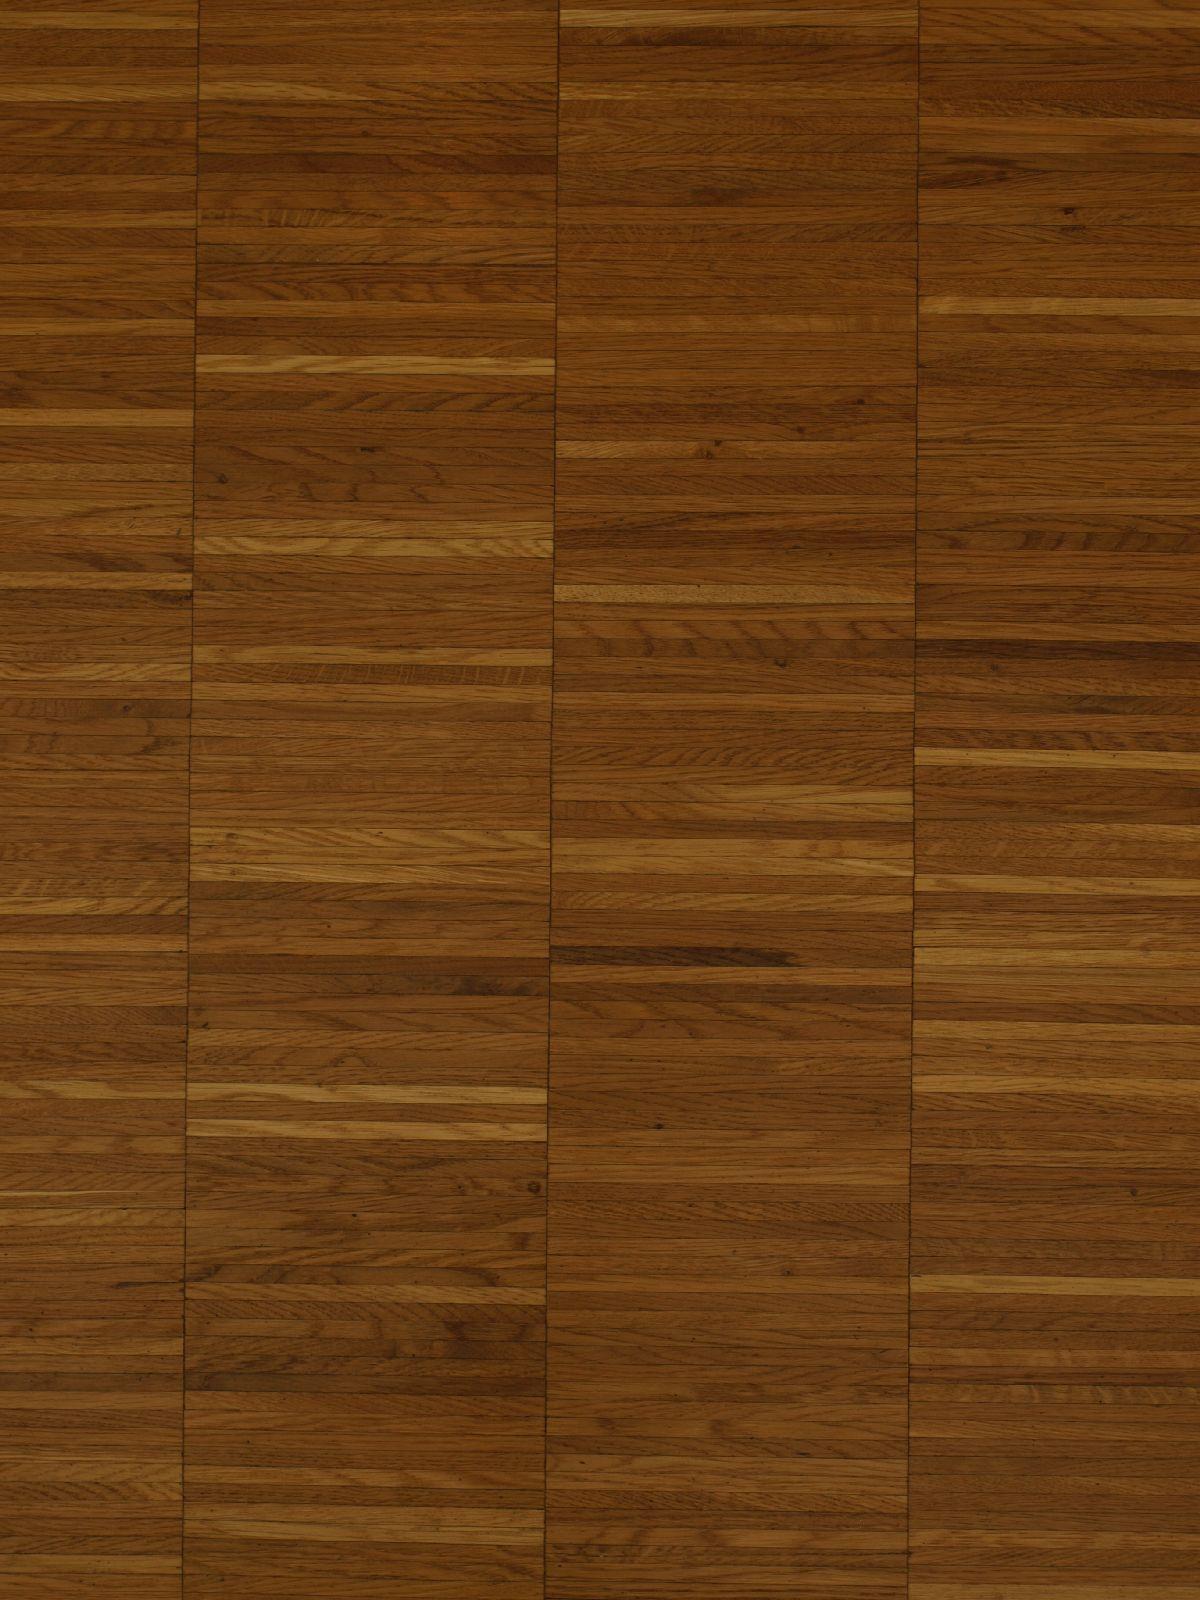 Wood_Texture_A_P4282774